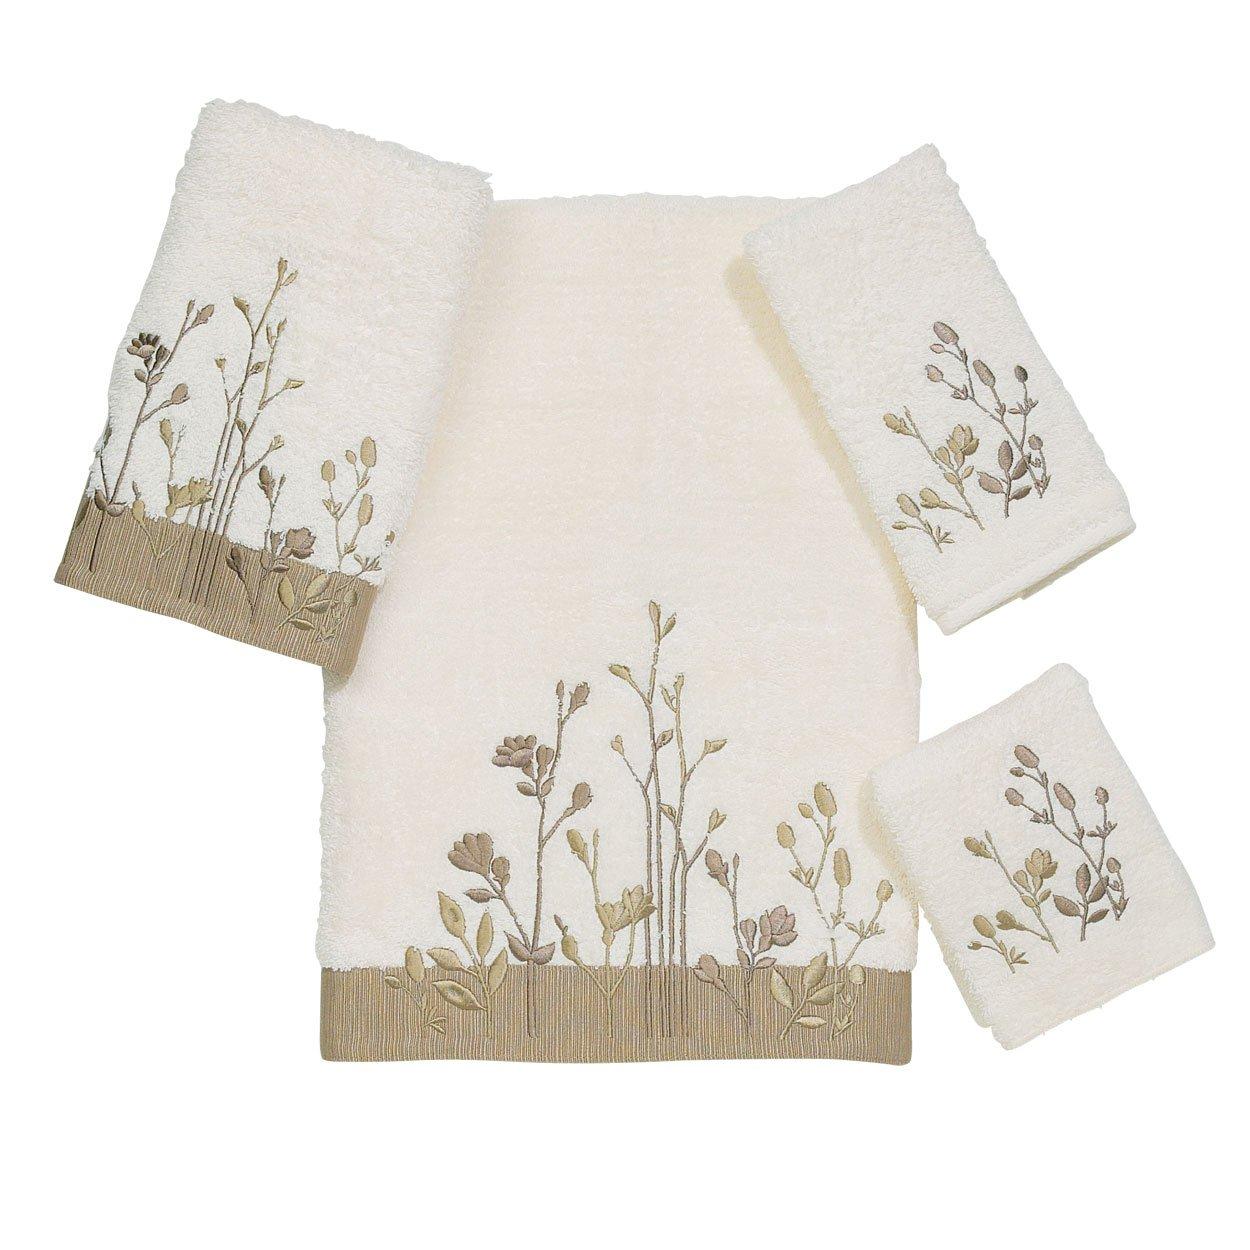 Amazon.com: Avanti Linens Floral Prints Bath Towel, Copper: Home ...